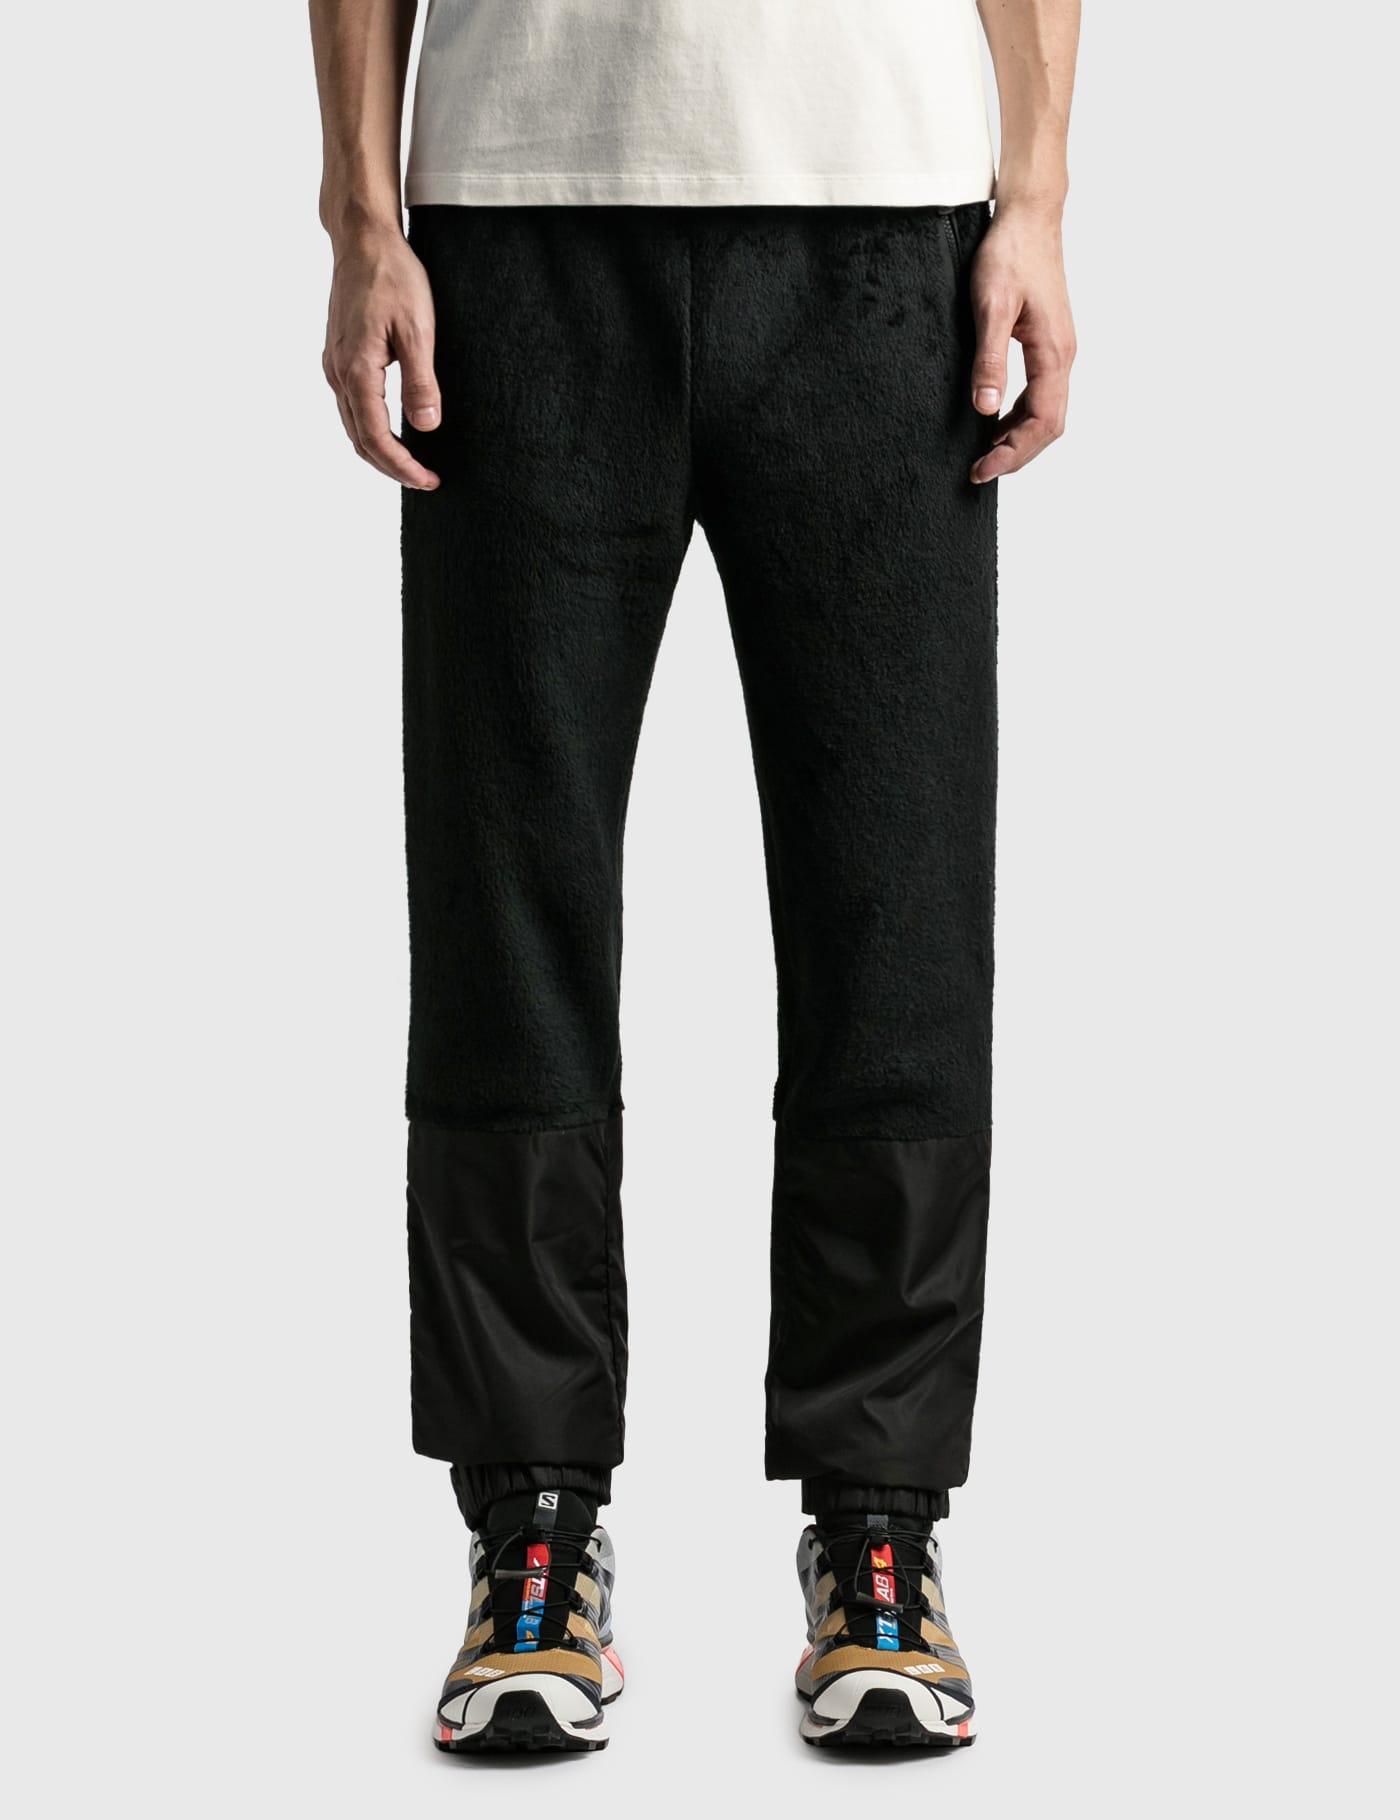 Grenoble Pants